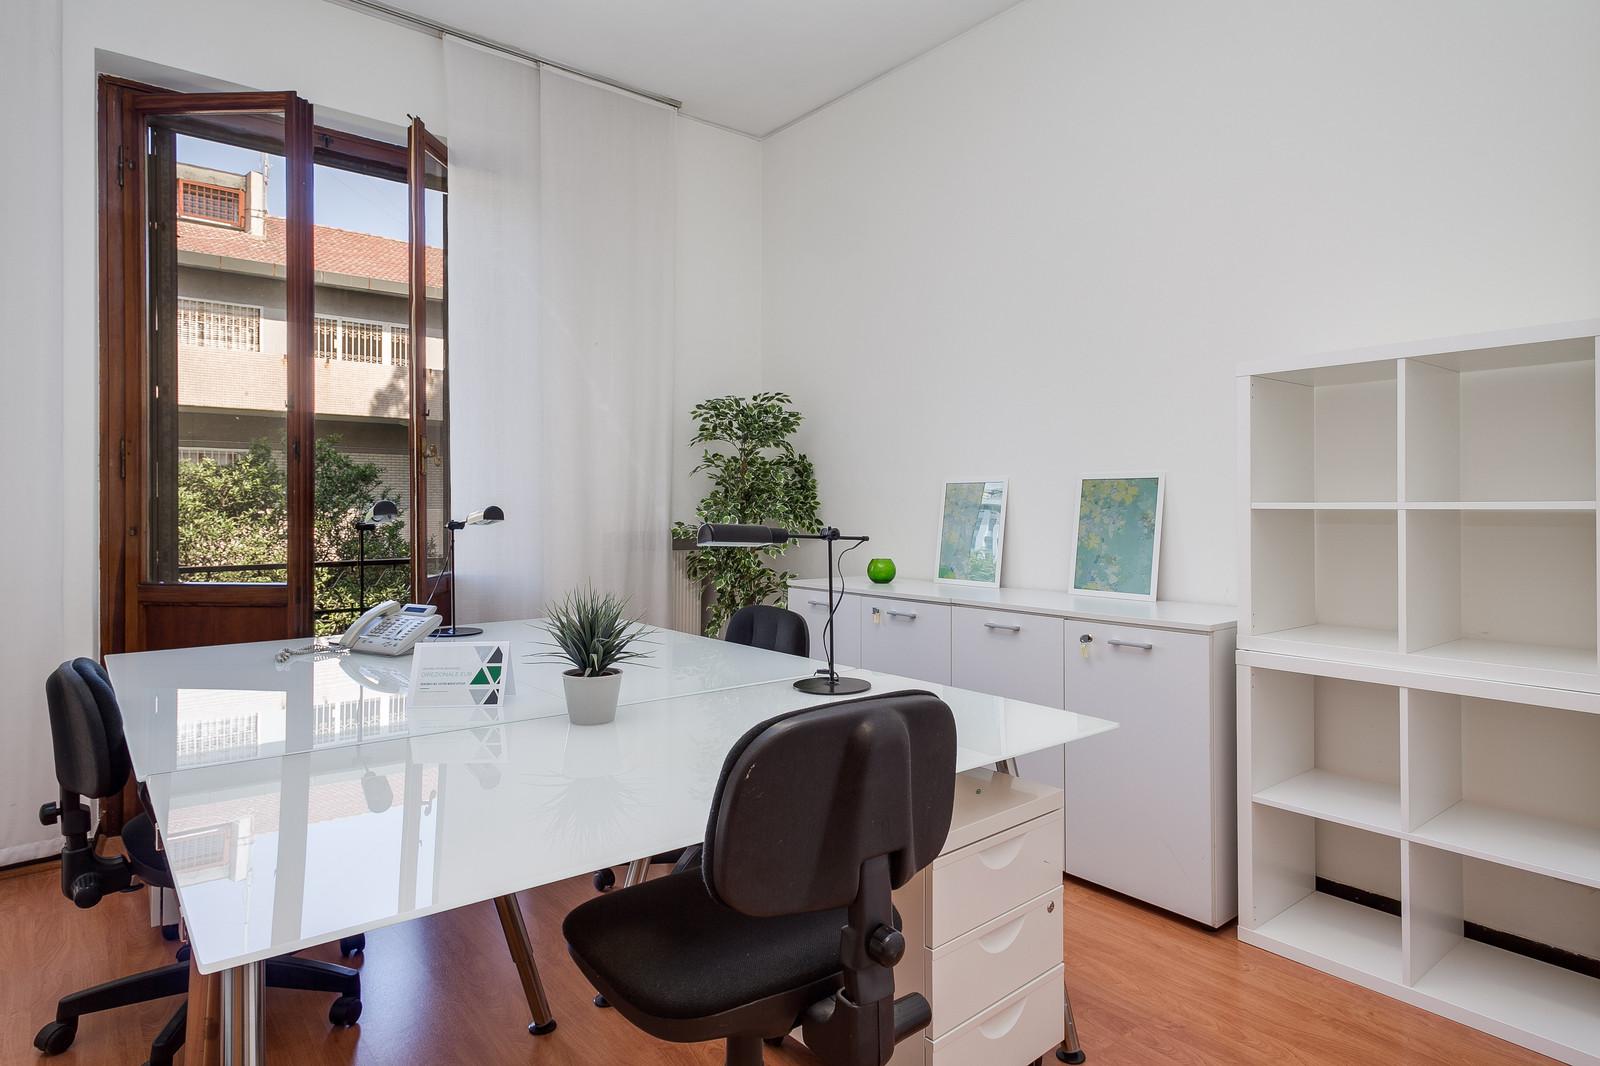 Direzionale eur affitto uffici arredati a roma uffici for Affitto uffici arredati roma